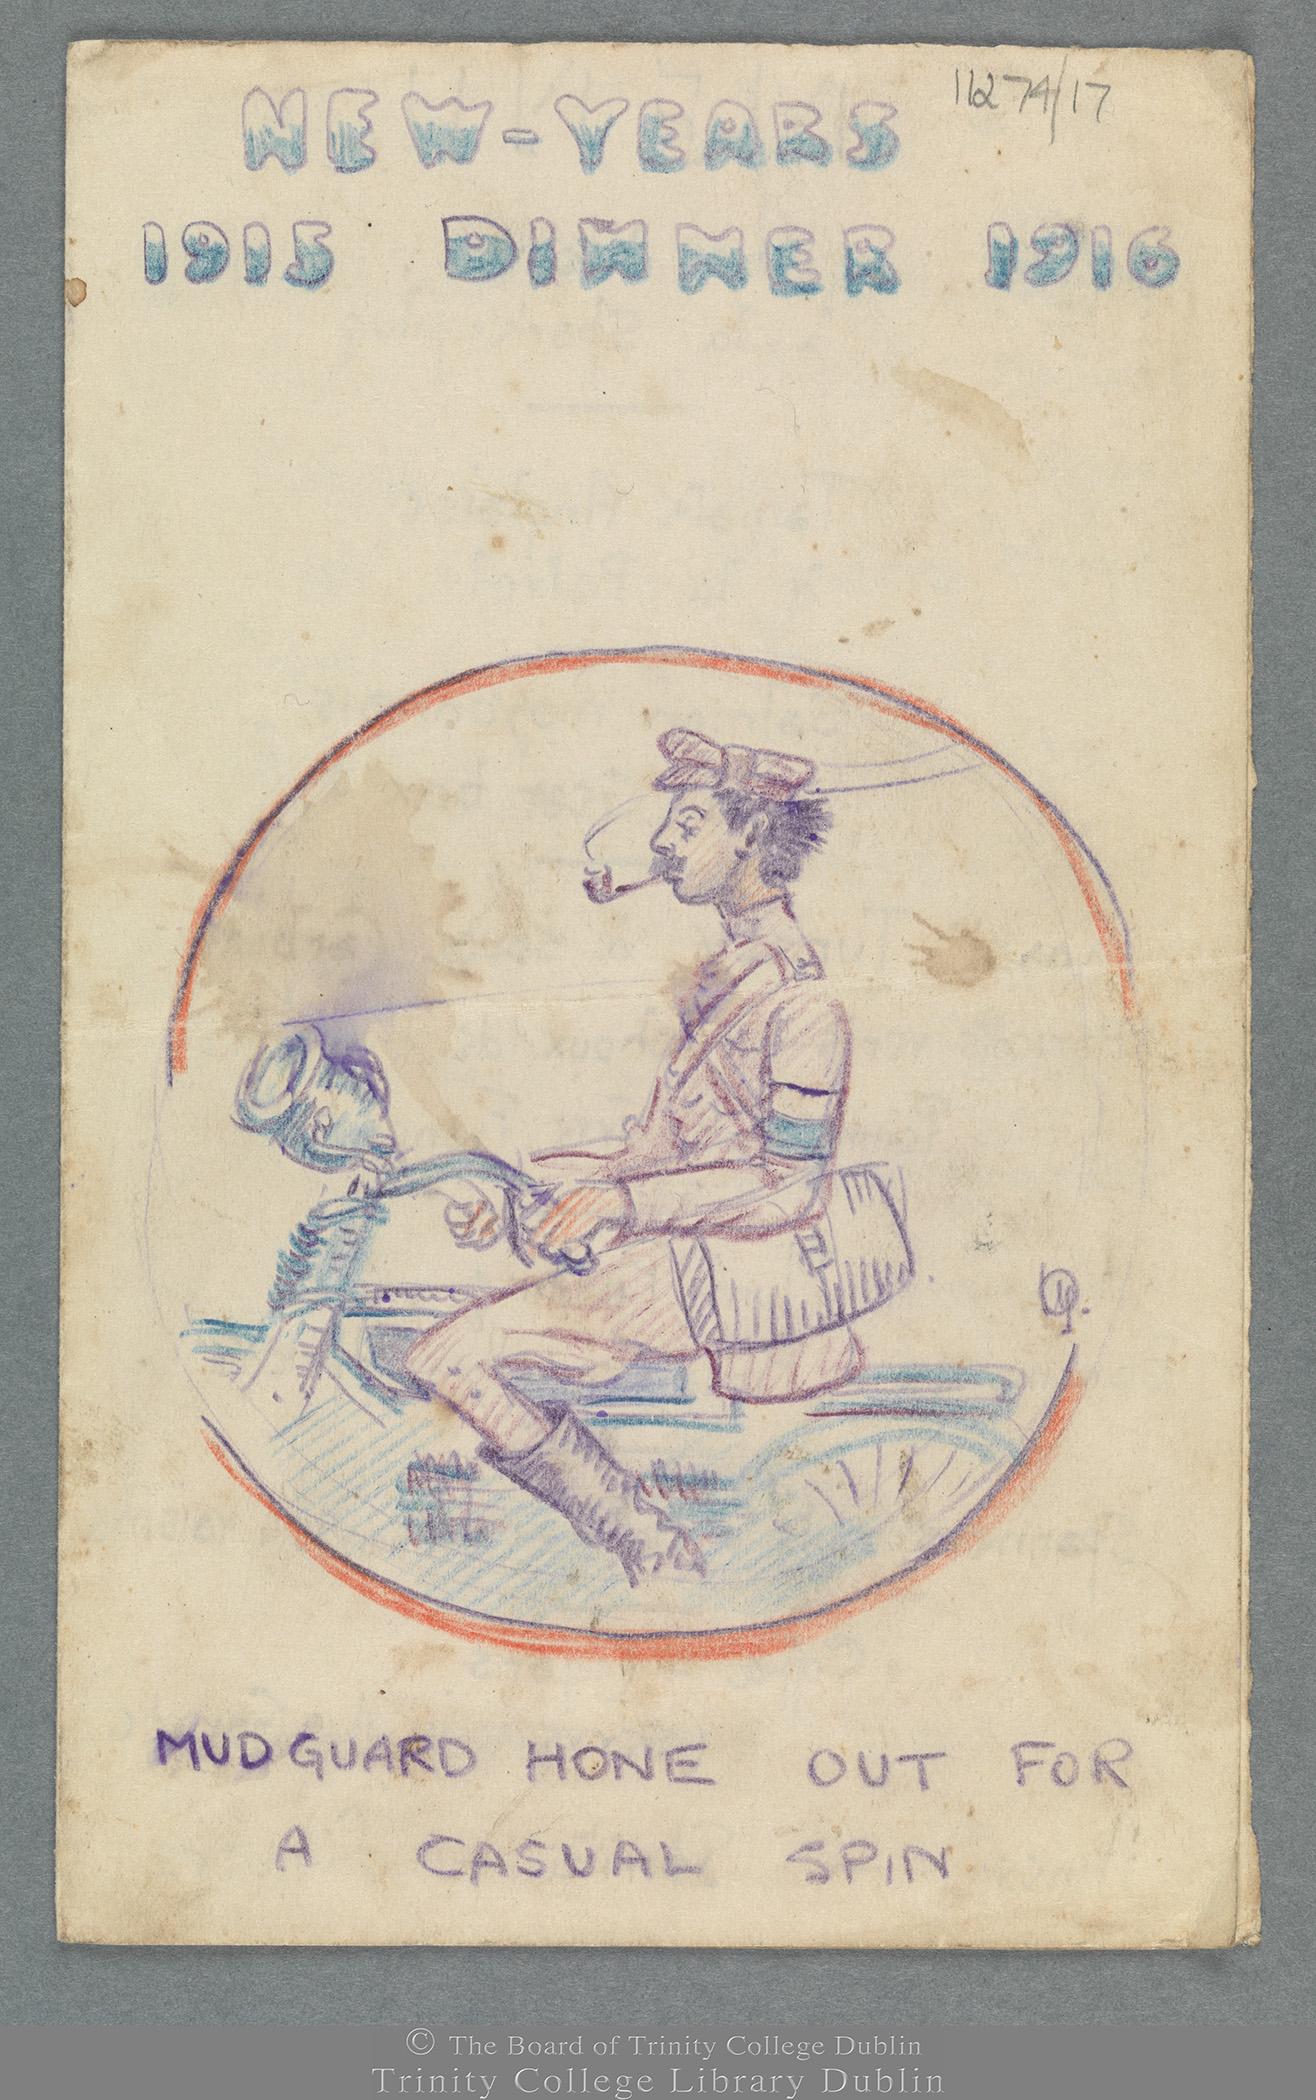 TCD MS 11274/17 folio 1 recto